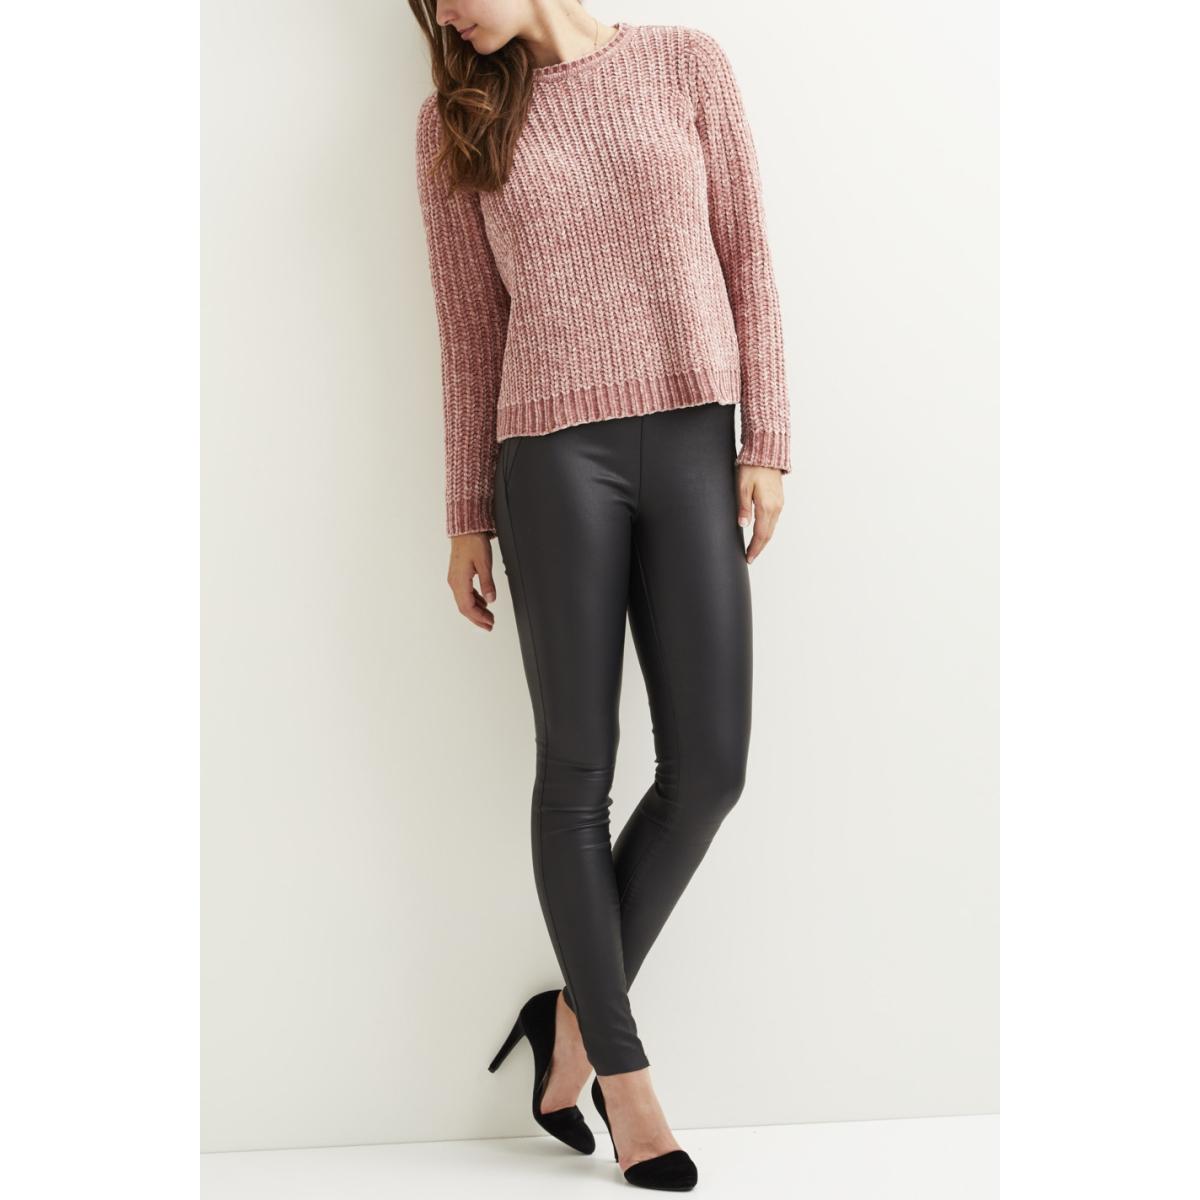 objoliviati knit pullover .i 92 23025086 object trui whitered rose